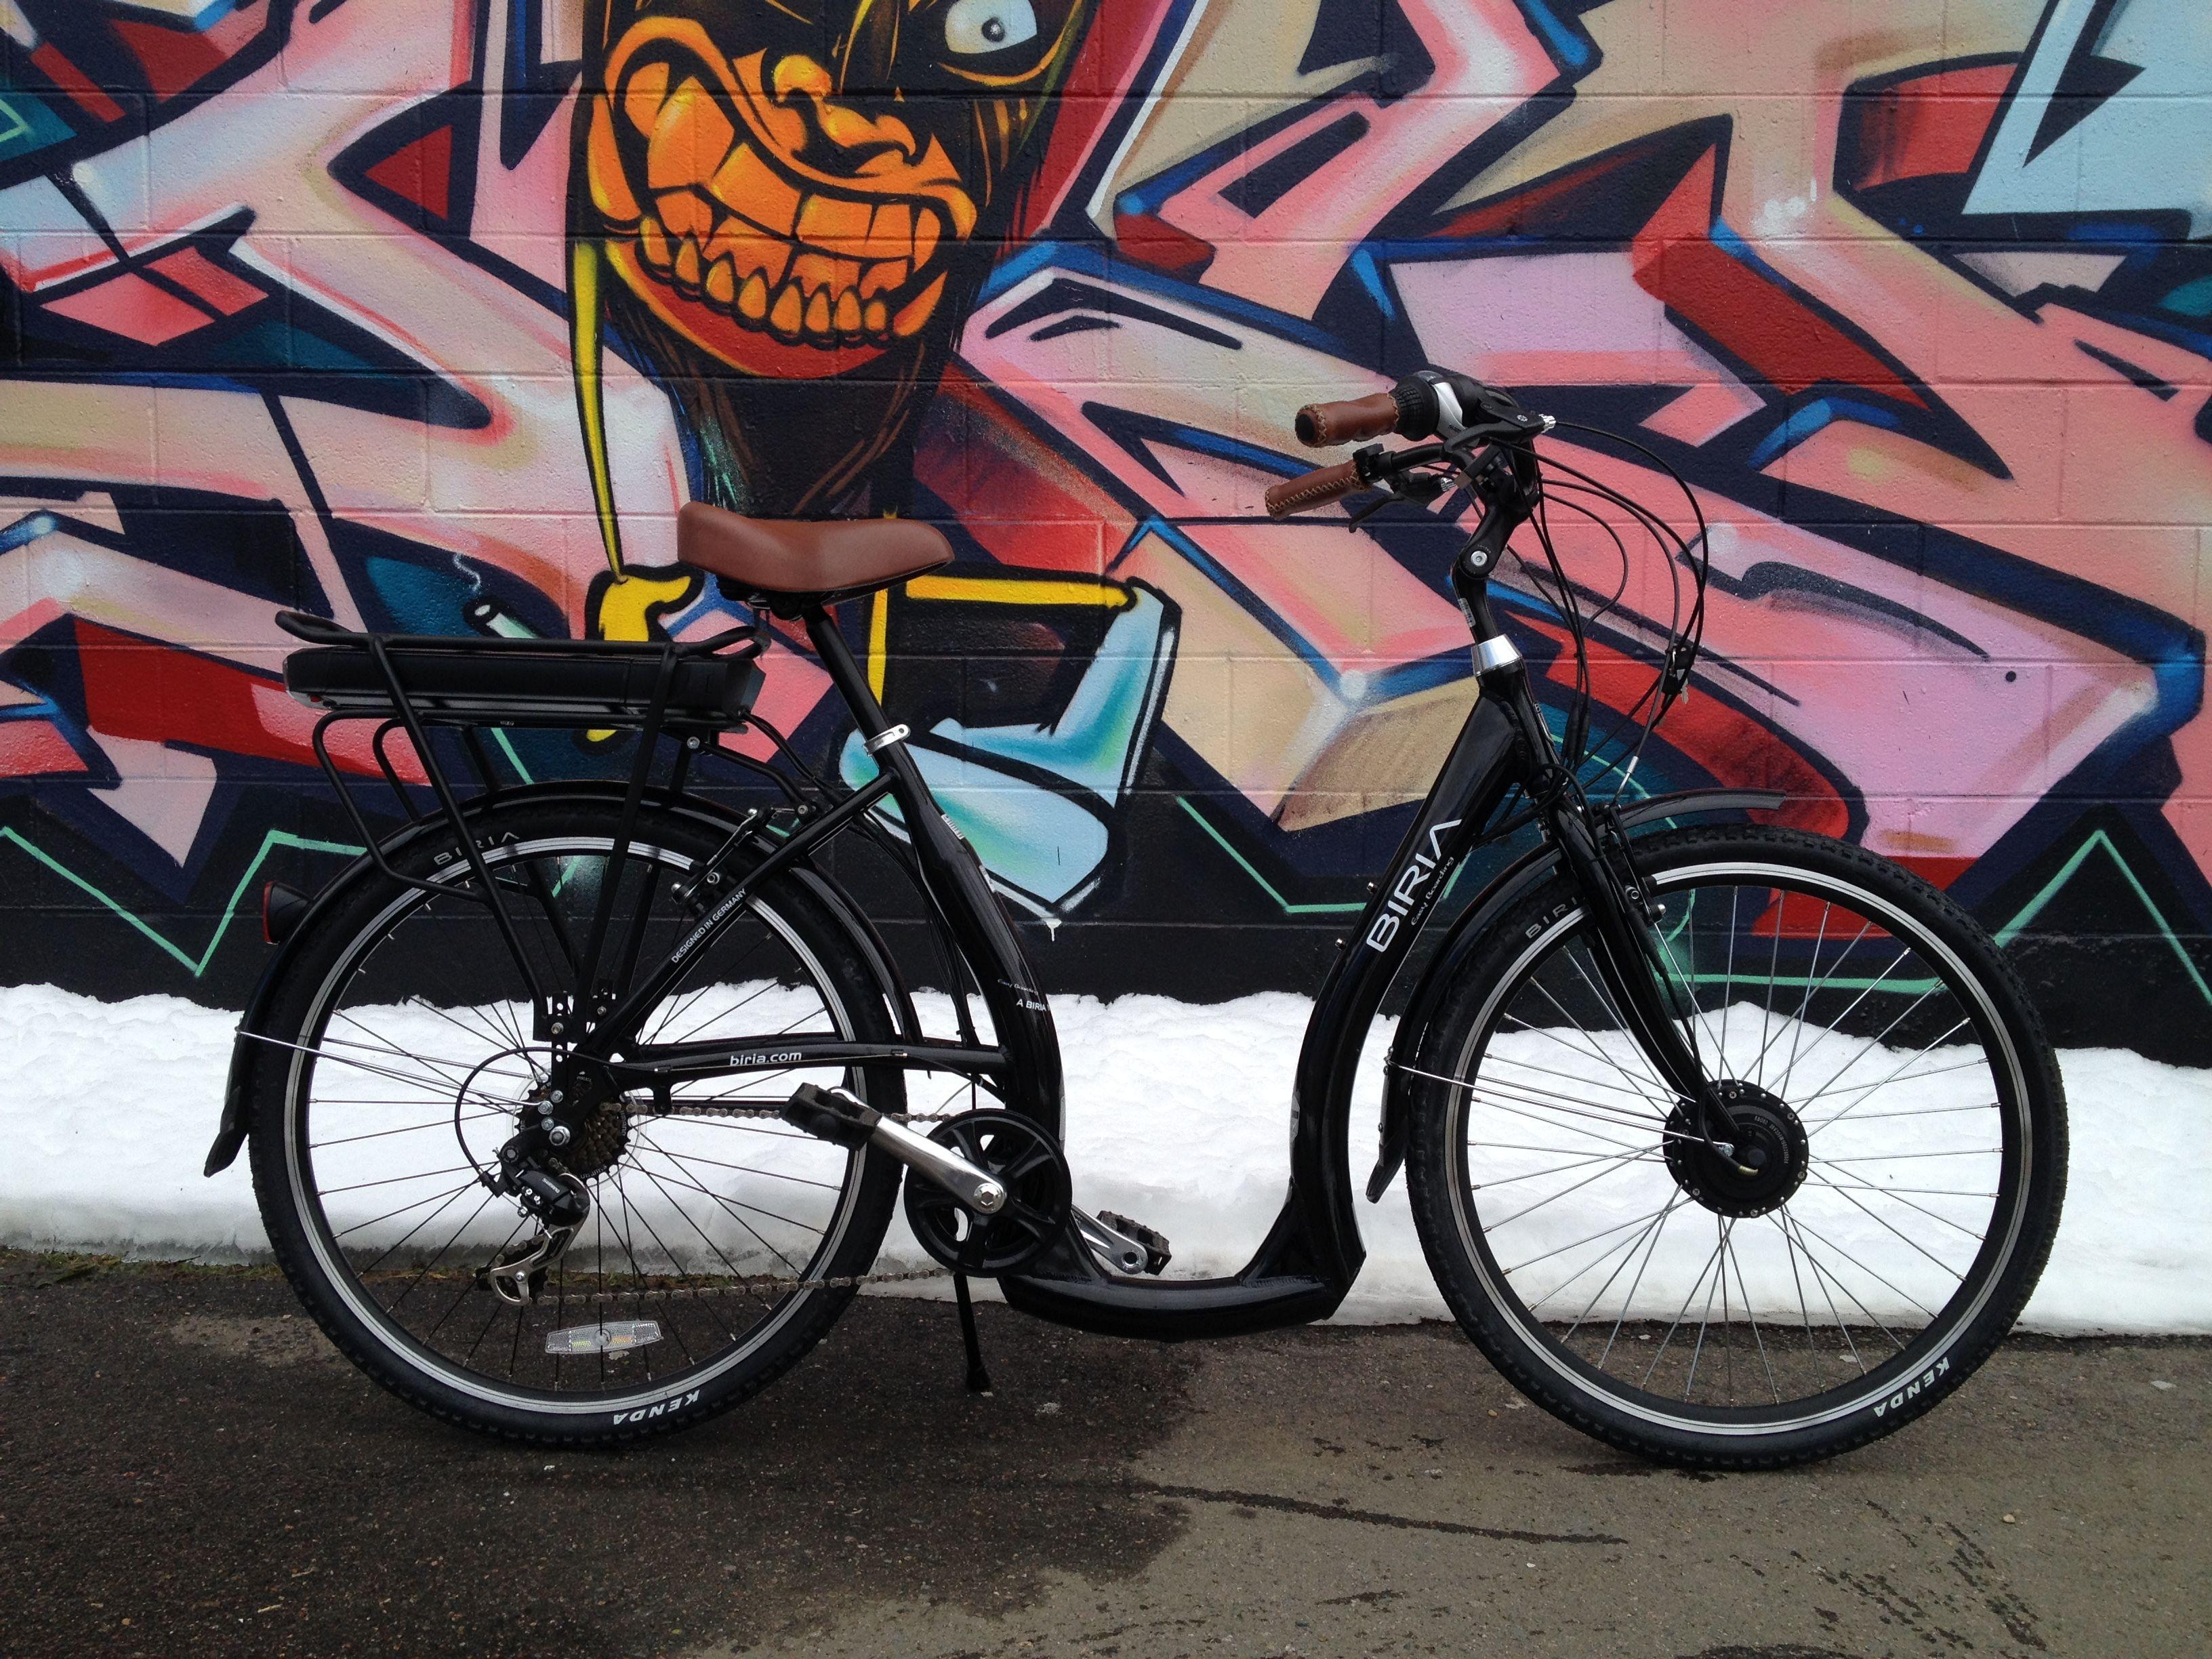 Ebo Cruiser Electric Bike Conversion Kit Installed On A Biria